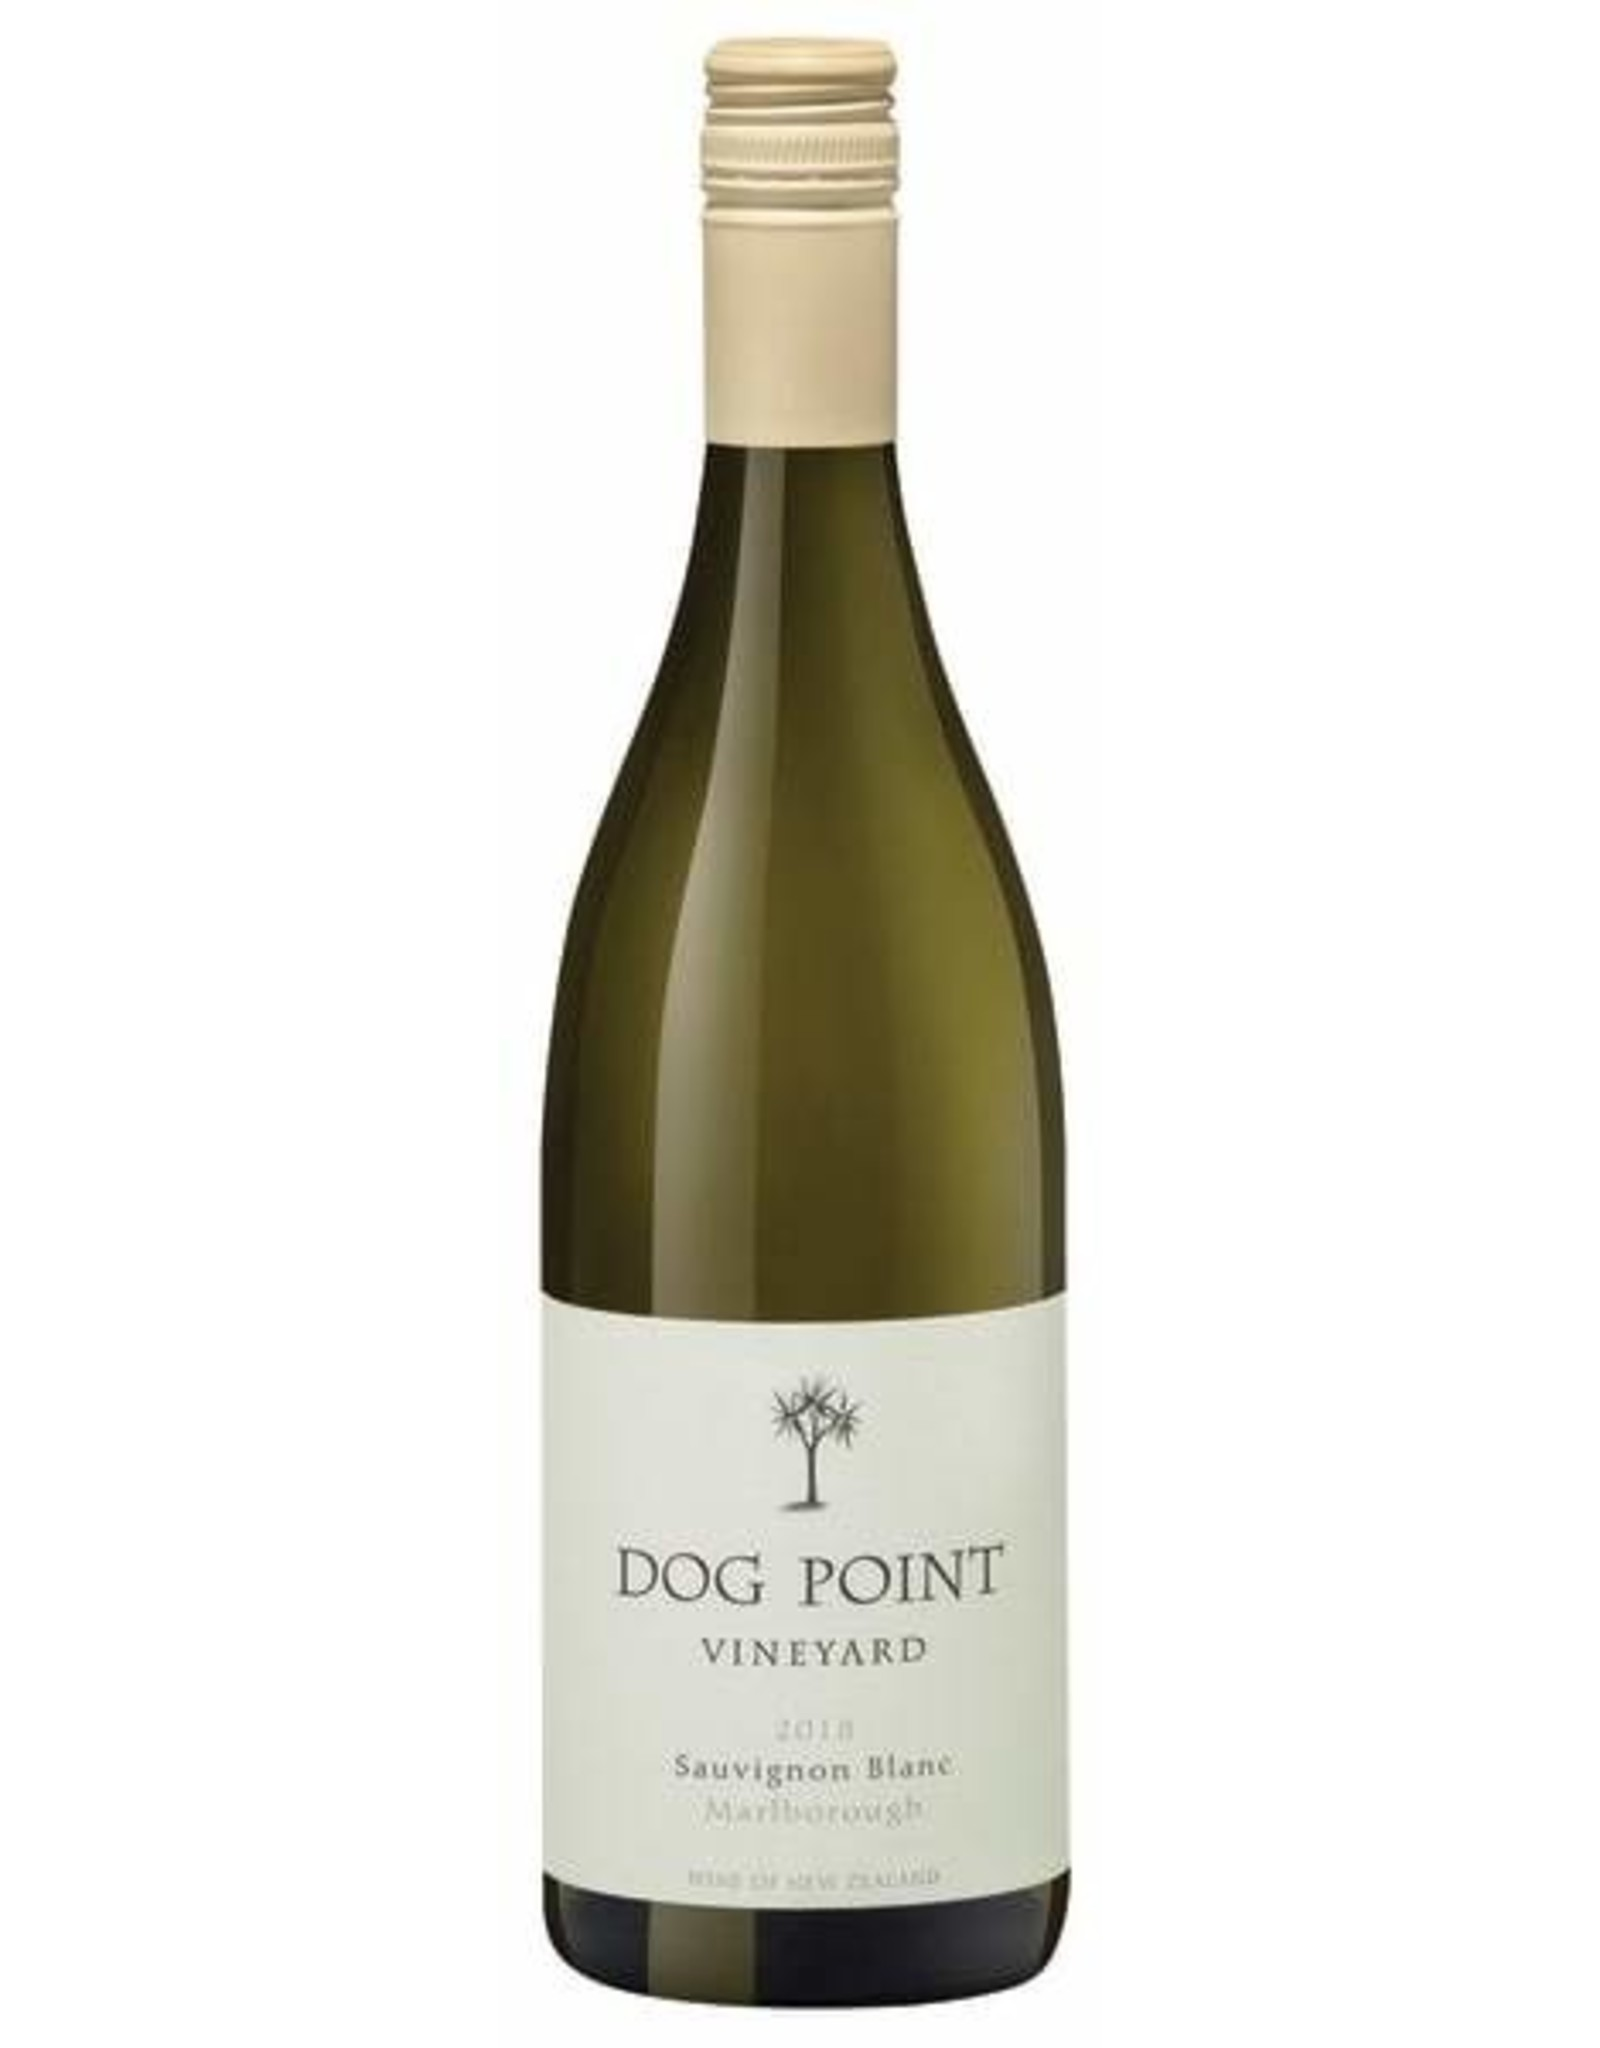 Dog Point Sauvignon Blanc